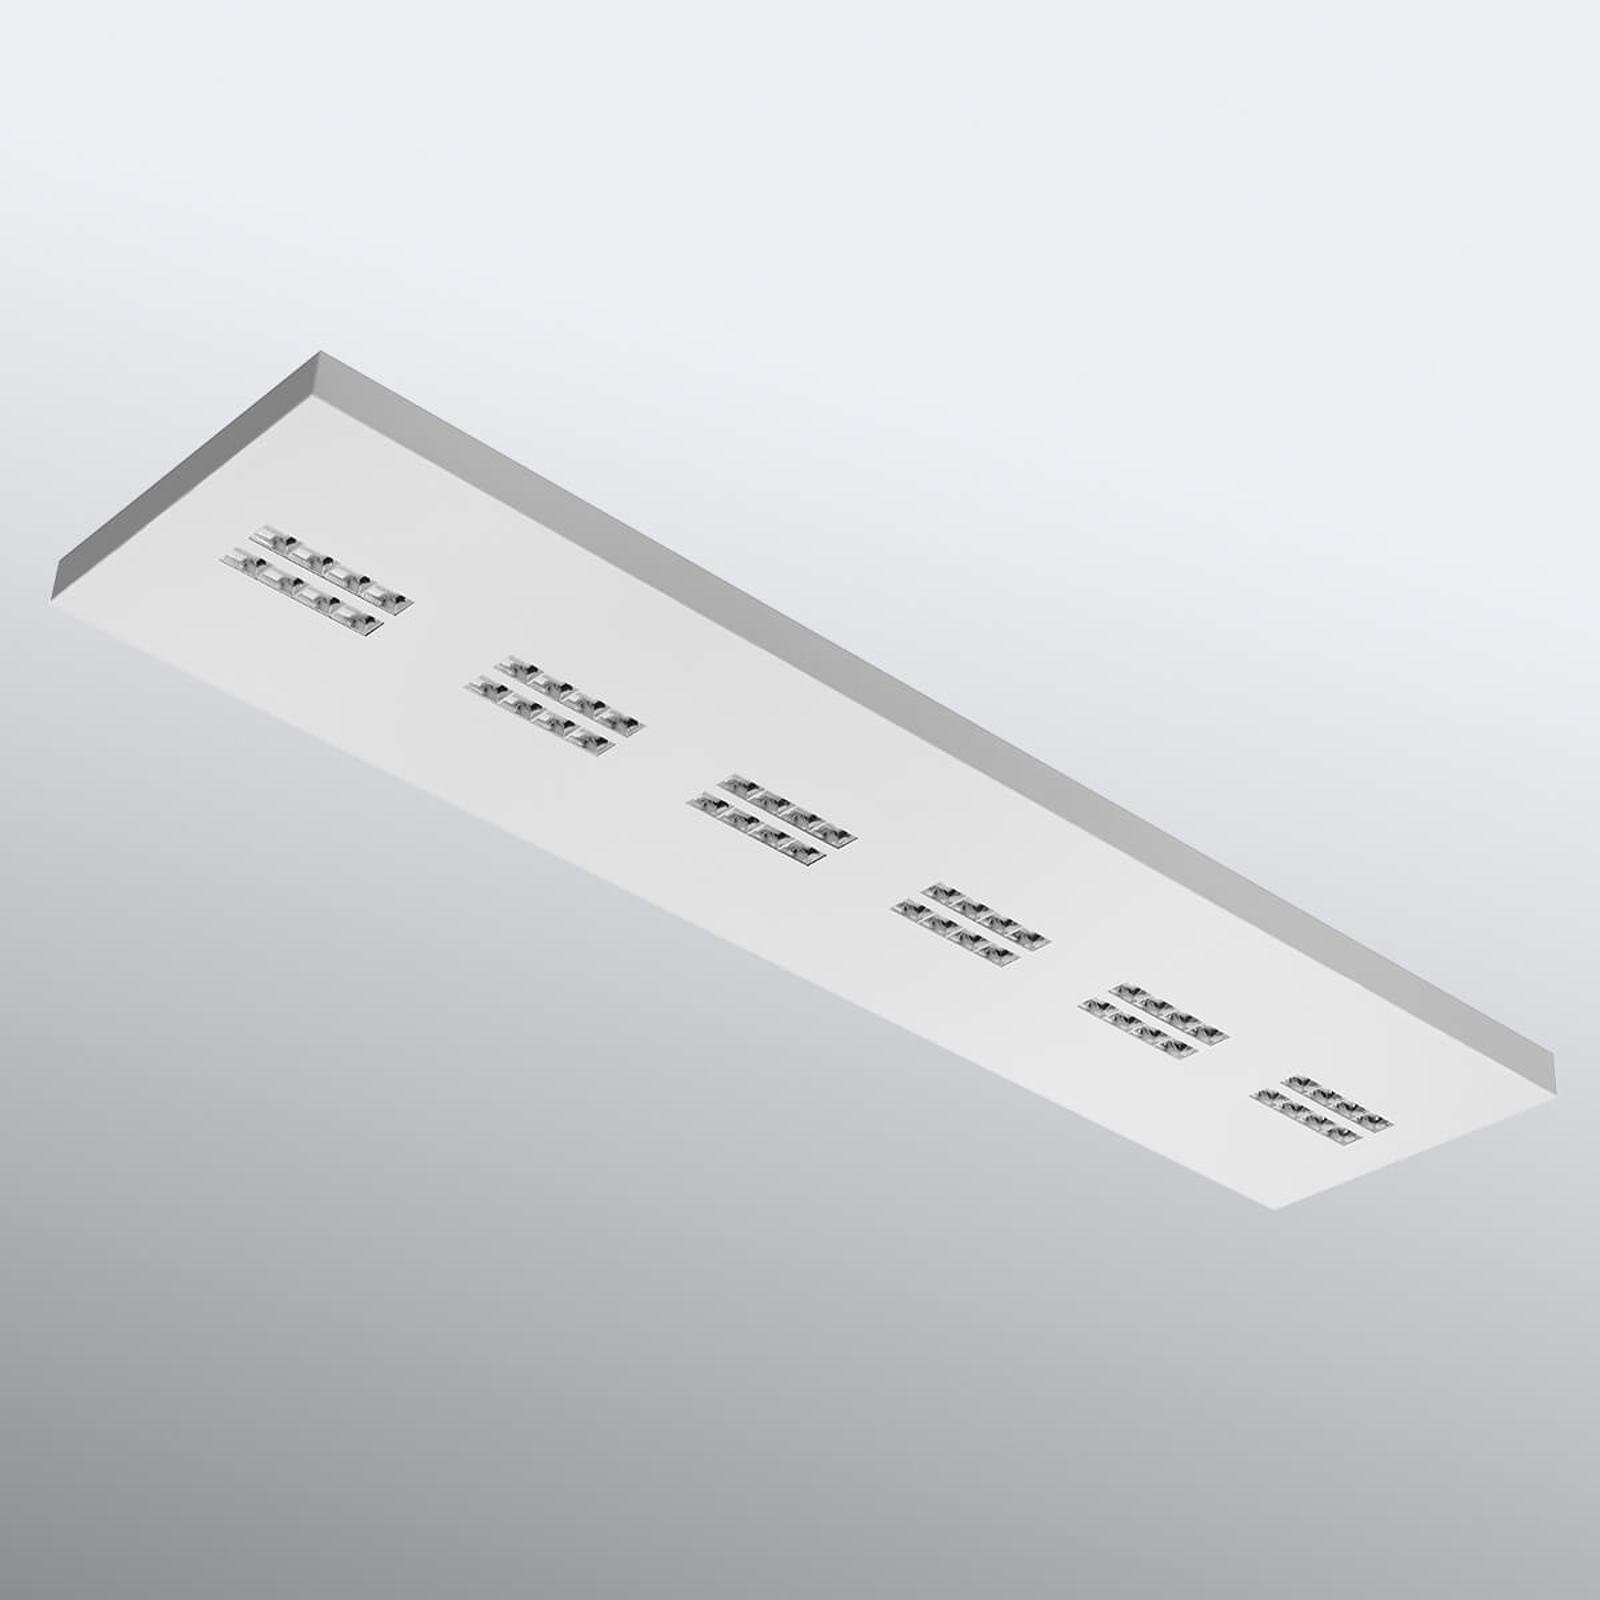 Plafonnier LED Declan II rectangulaire, 3000K